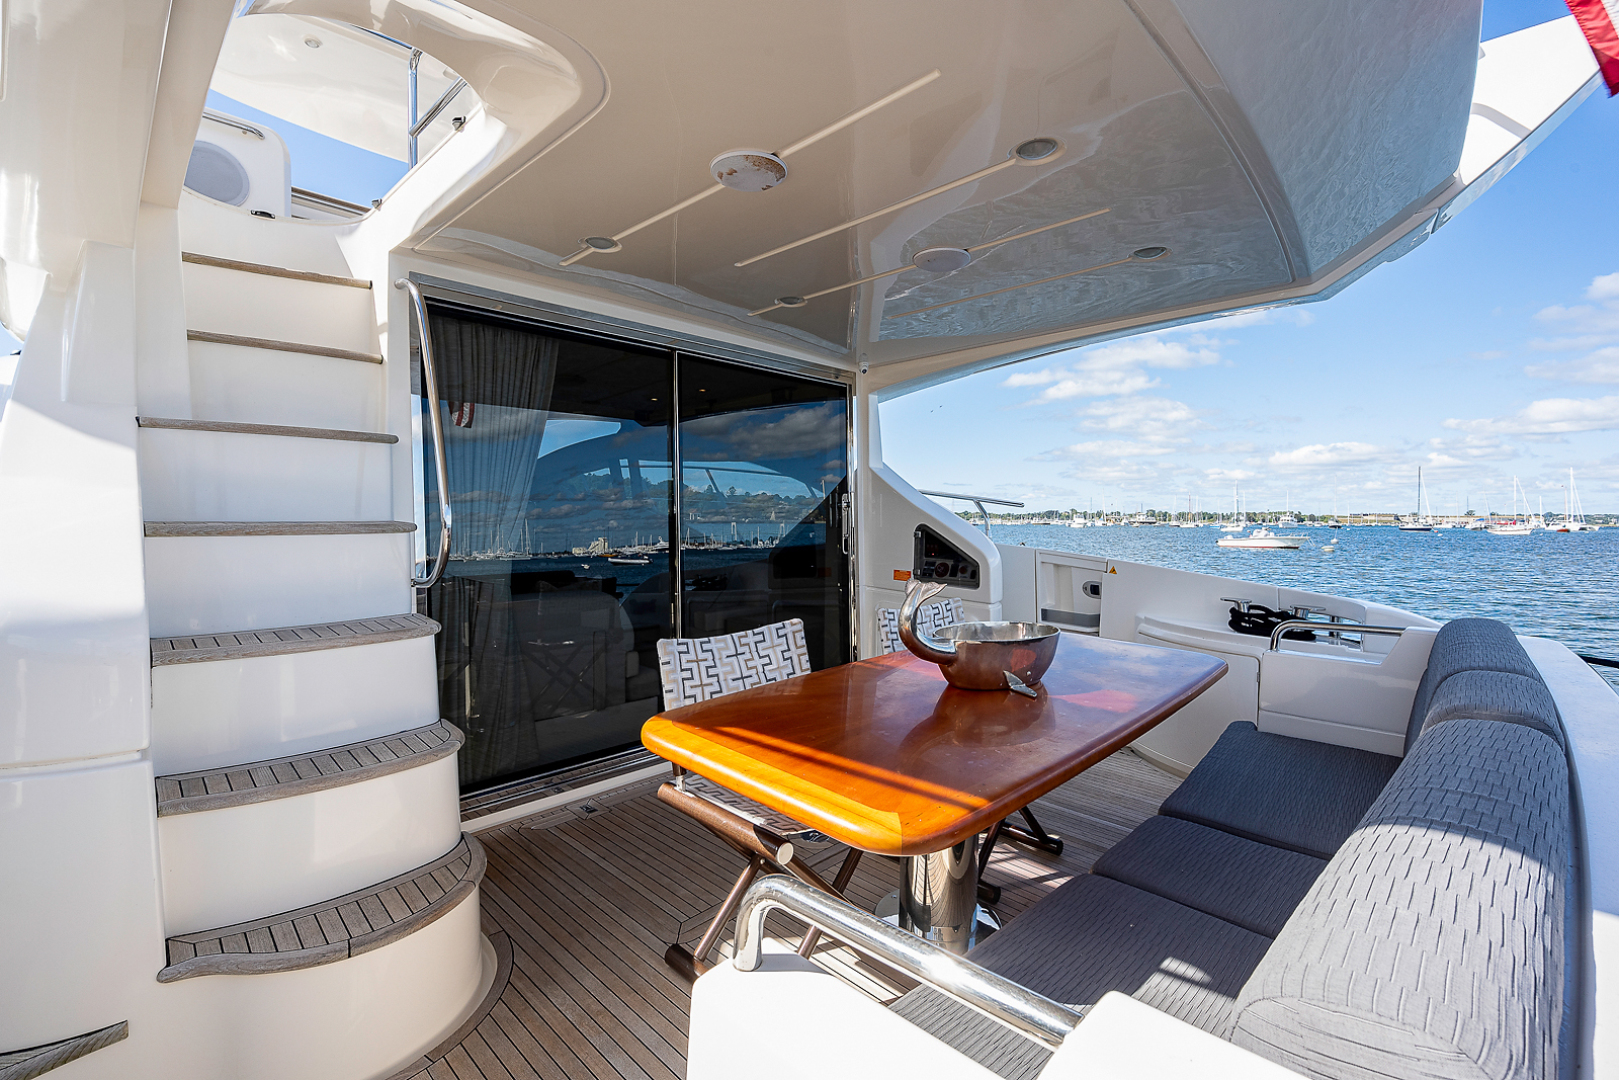 Azimut-58 Fly Motor Yacht 2011-Nova Fort Lauderdale-Florida-United States-58_azimut_nova__aft_deck13-1490484 | Thumbnail